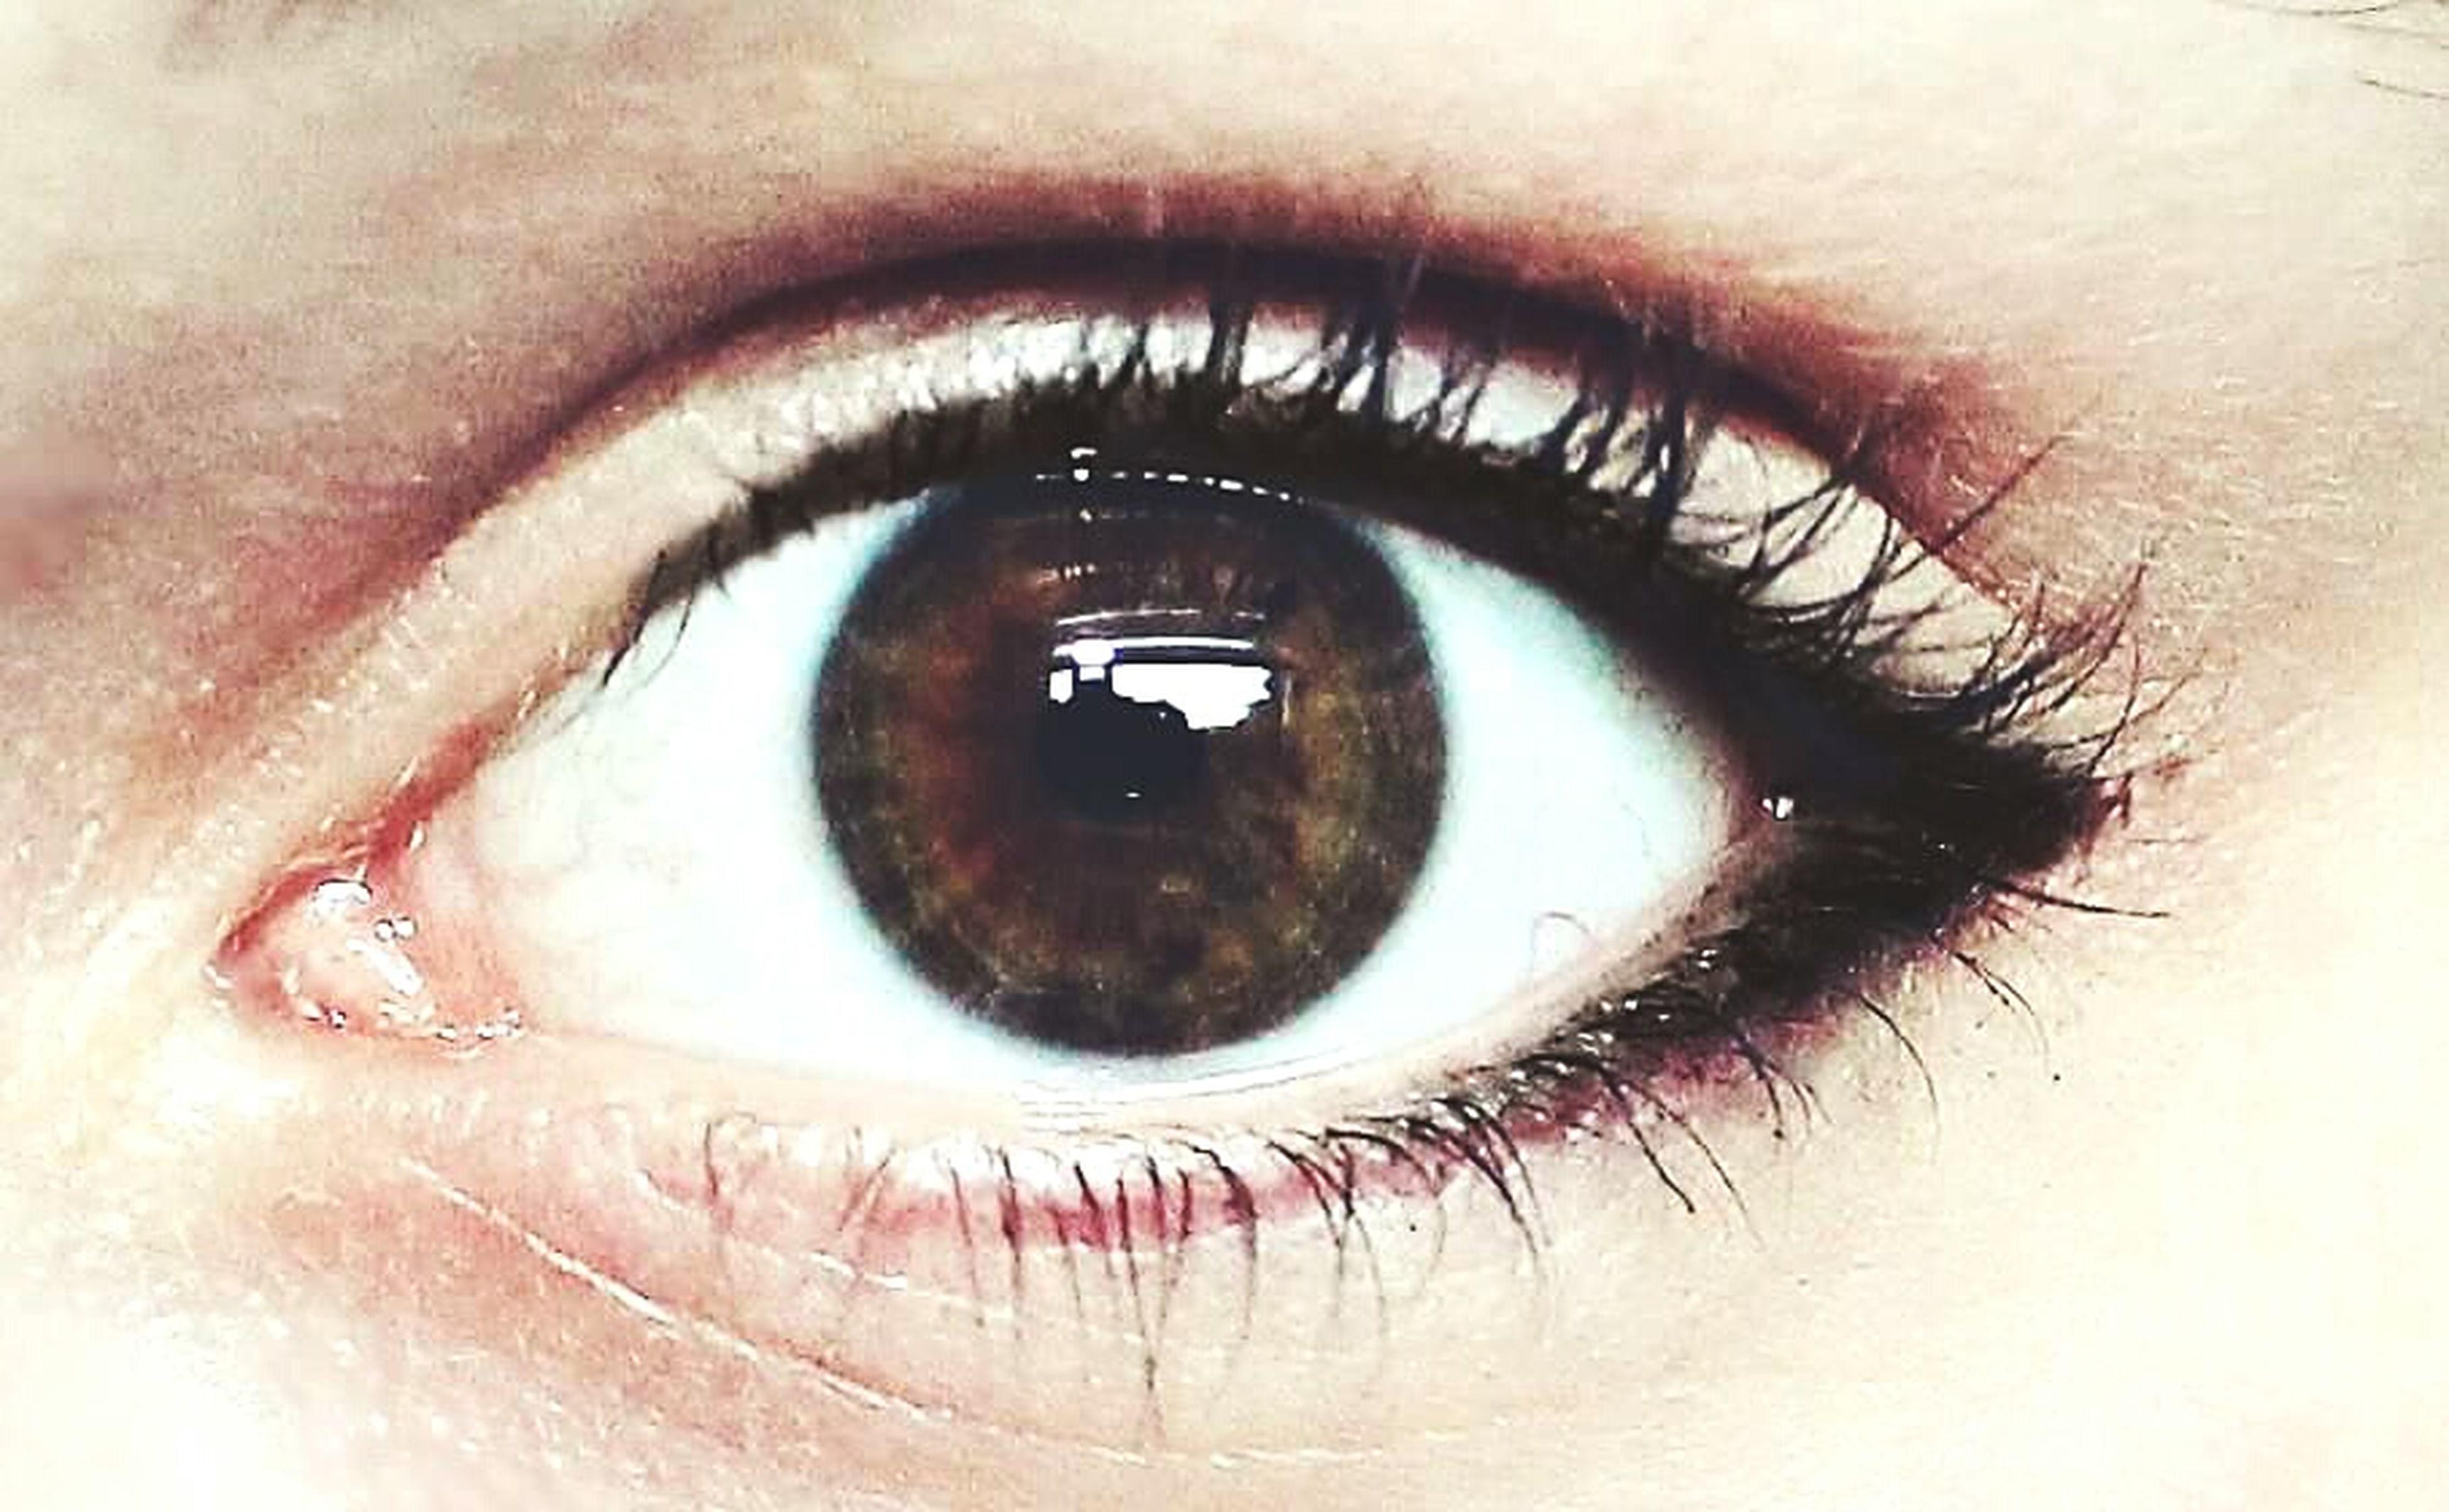 human eye, eyelash, eyesight, close-up, sensory perception, looking at camera, eyeball, portrait, iris - eye, part of, extreme close-up, human skin, lifestyles, human face, eyebrow, extreme close up, vision